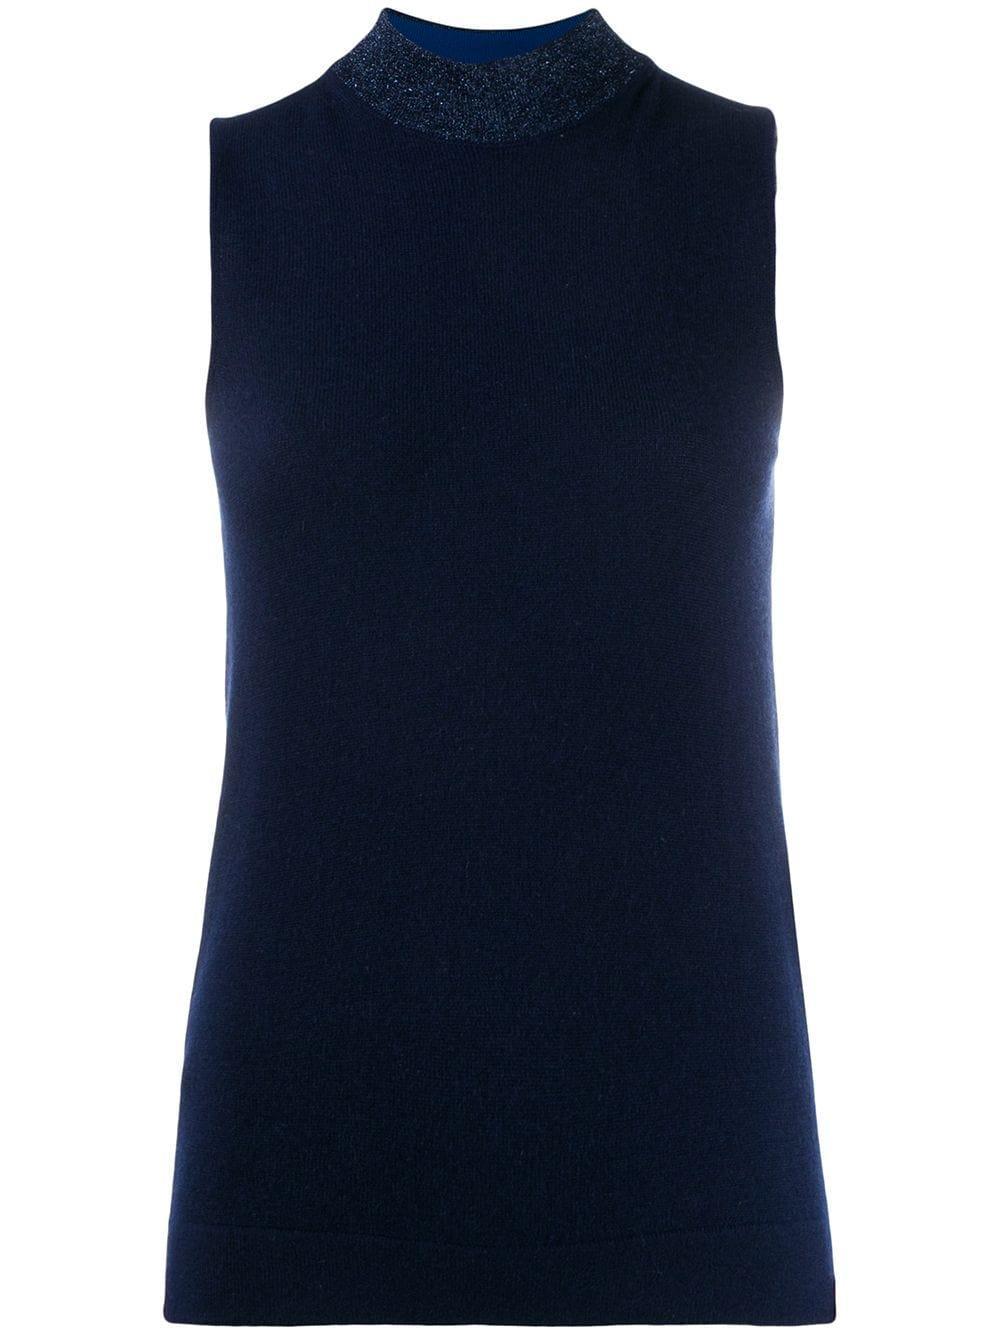 Sleeve Less Mock Neck Cashmere Top Item # MDN00210-BK007W